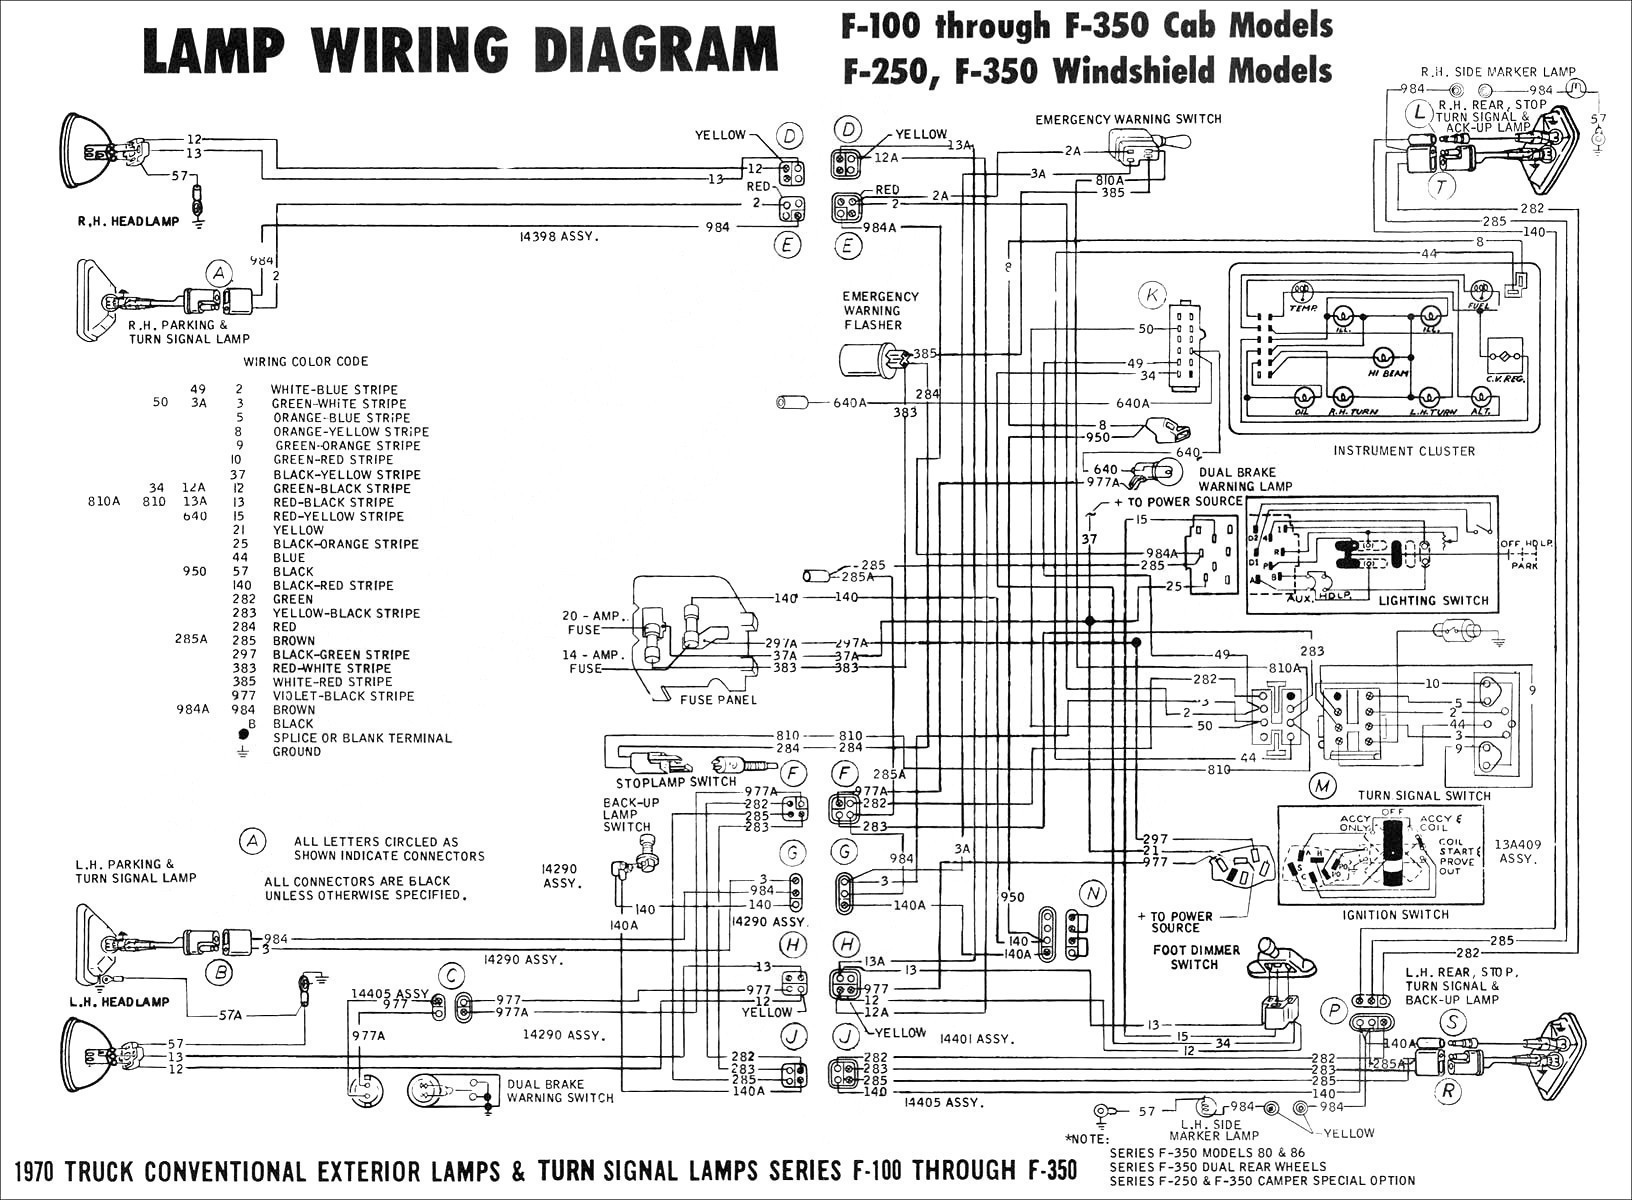 1998 Nissan Altima Engine Diagram My Wiring Radio 2000 Audi A4 Valid 1999 2018